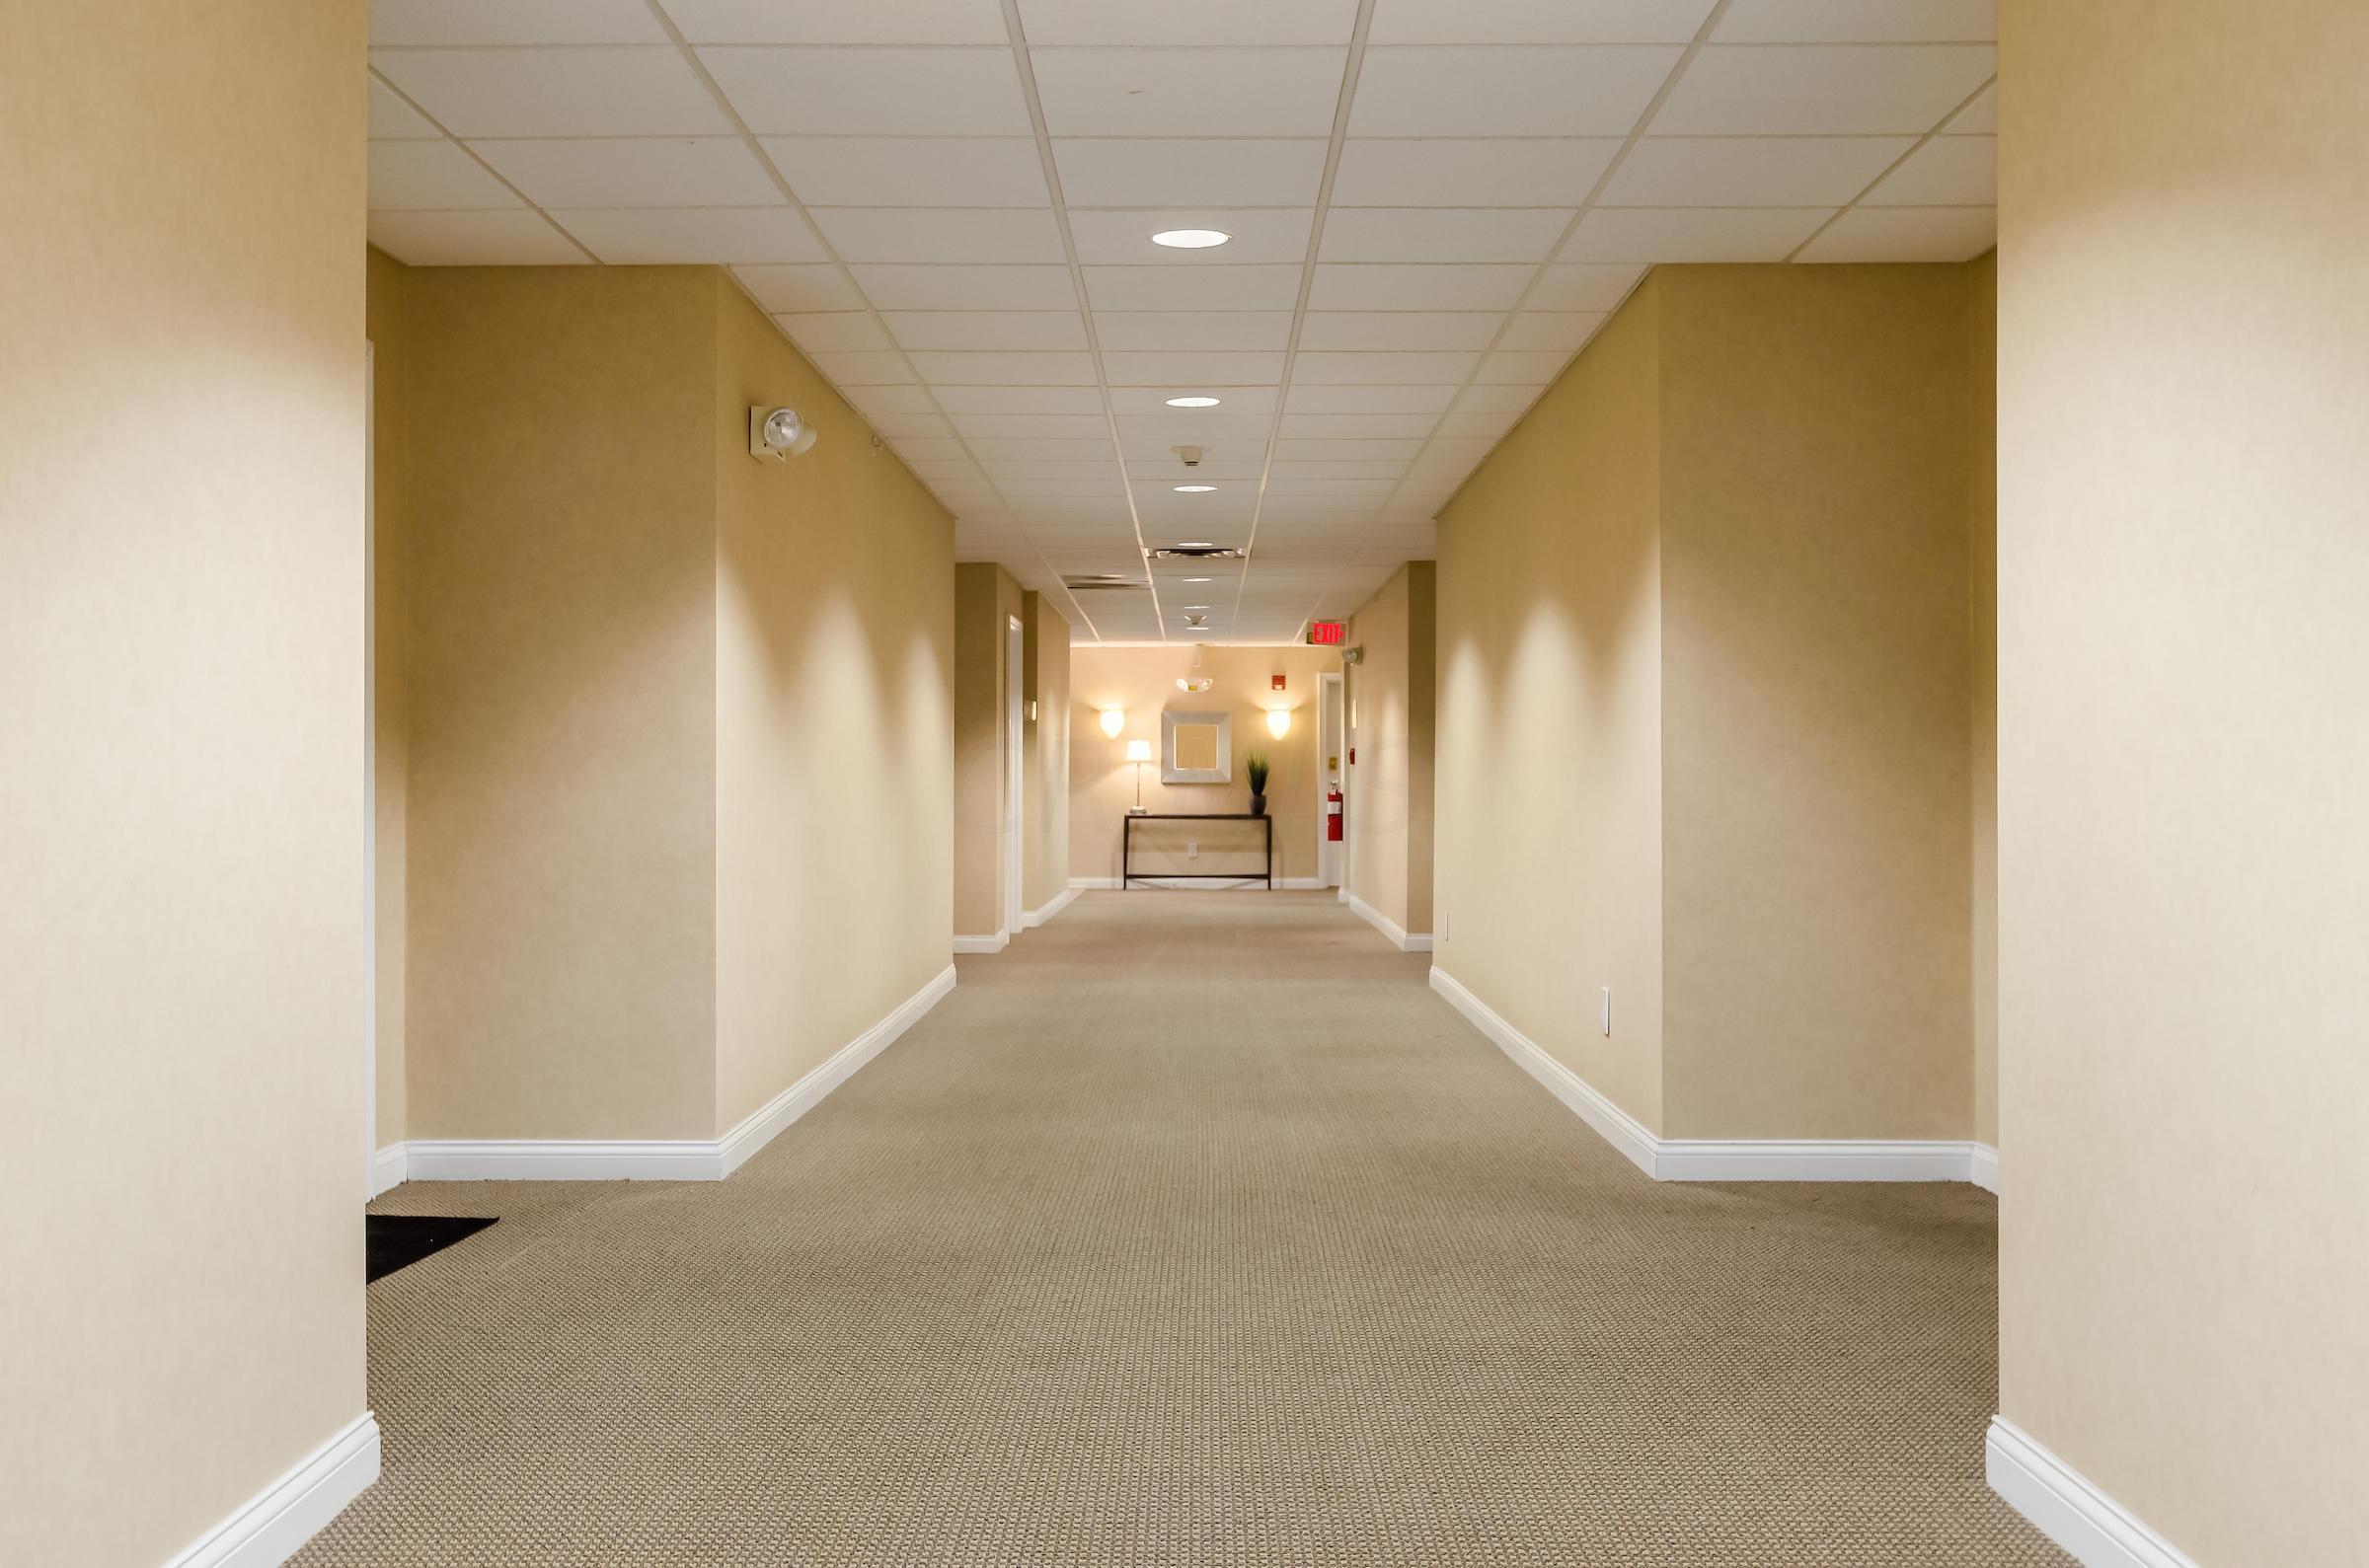 2245 Riverside Drive, Columbus, Ohio 43221, 2 Bedrooms Bedrooms, ,2 BathroomsBathrooms,Residential,For Sale,Riverside,220019602